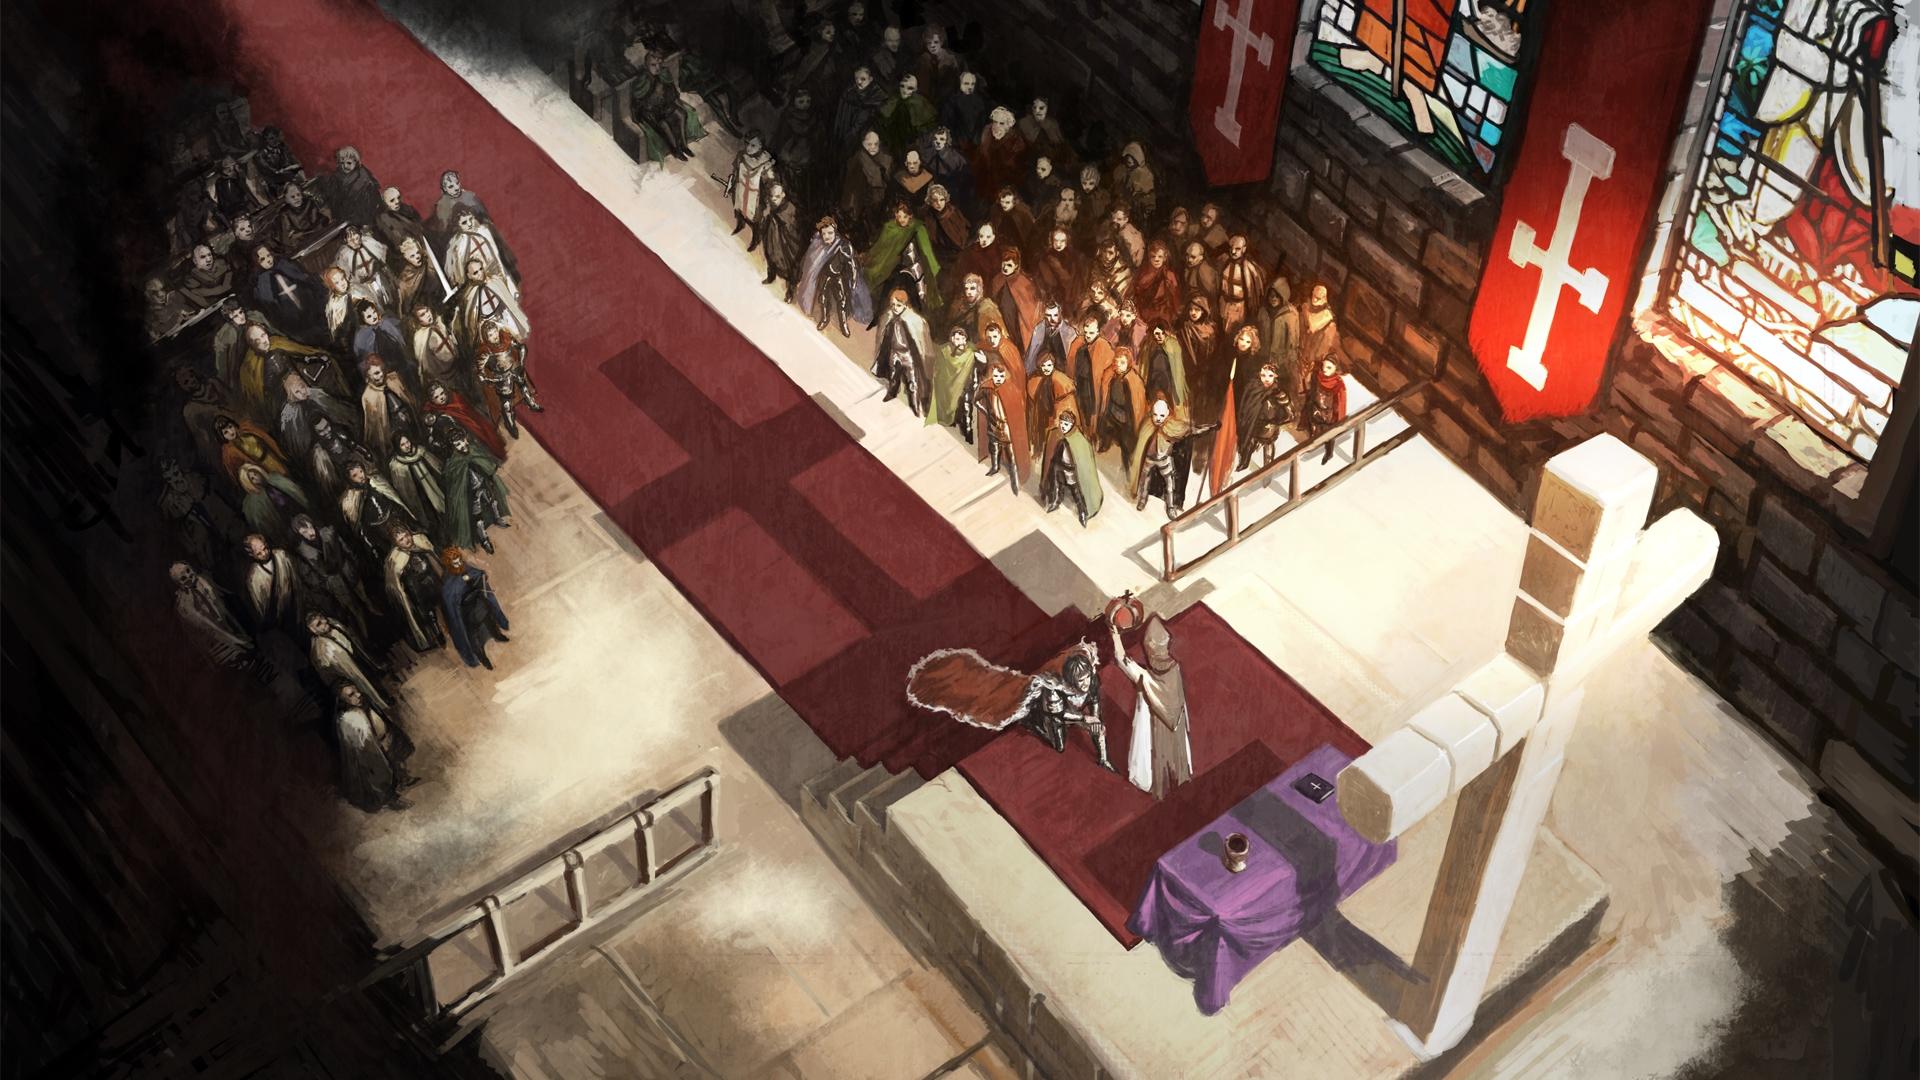 Diablo Hd Wallpaper 7 Crusader Kings Ii Hd Wallpapers Backgrounds